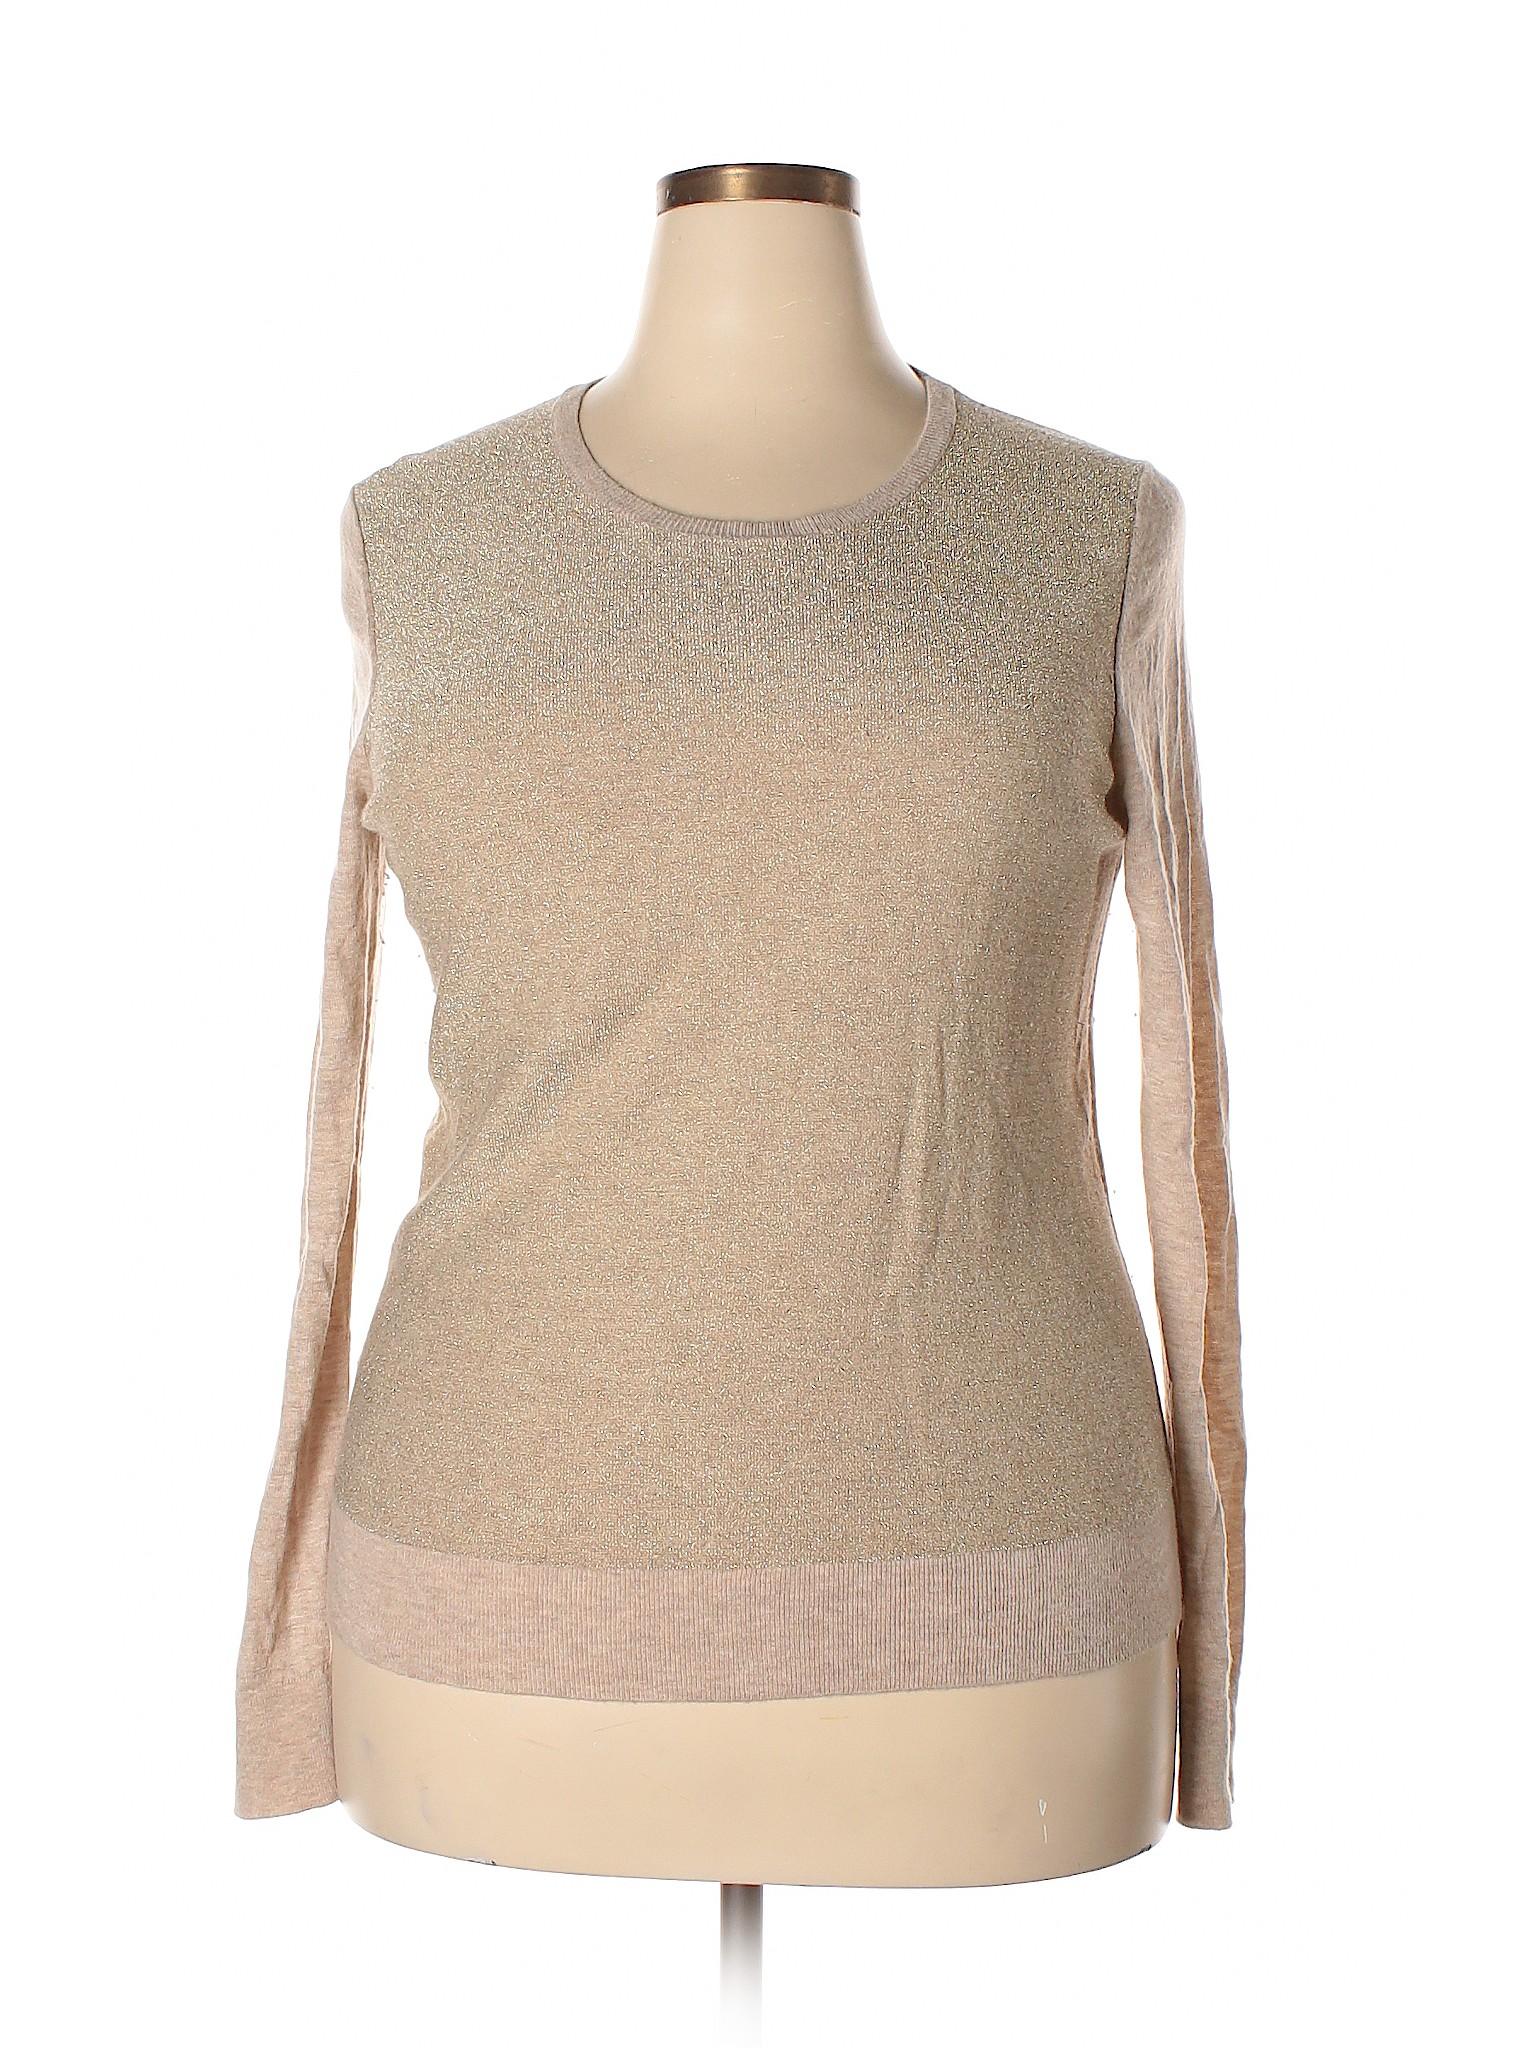 Taylor Boutique Taylor Sweater Sweater Boutique Boutique Pullover Taylor Pullover Ann Ann Ann AIxRzraqI